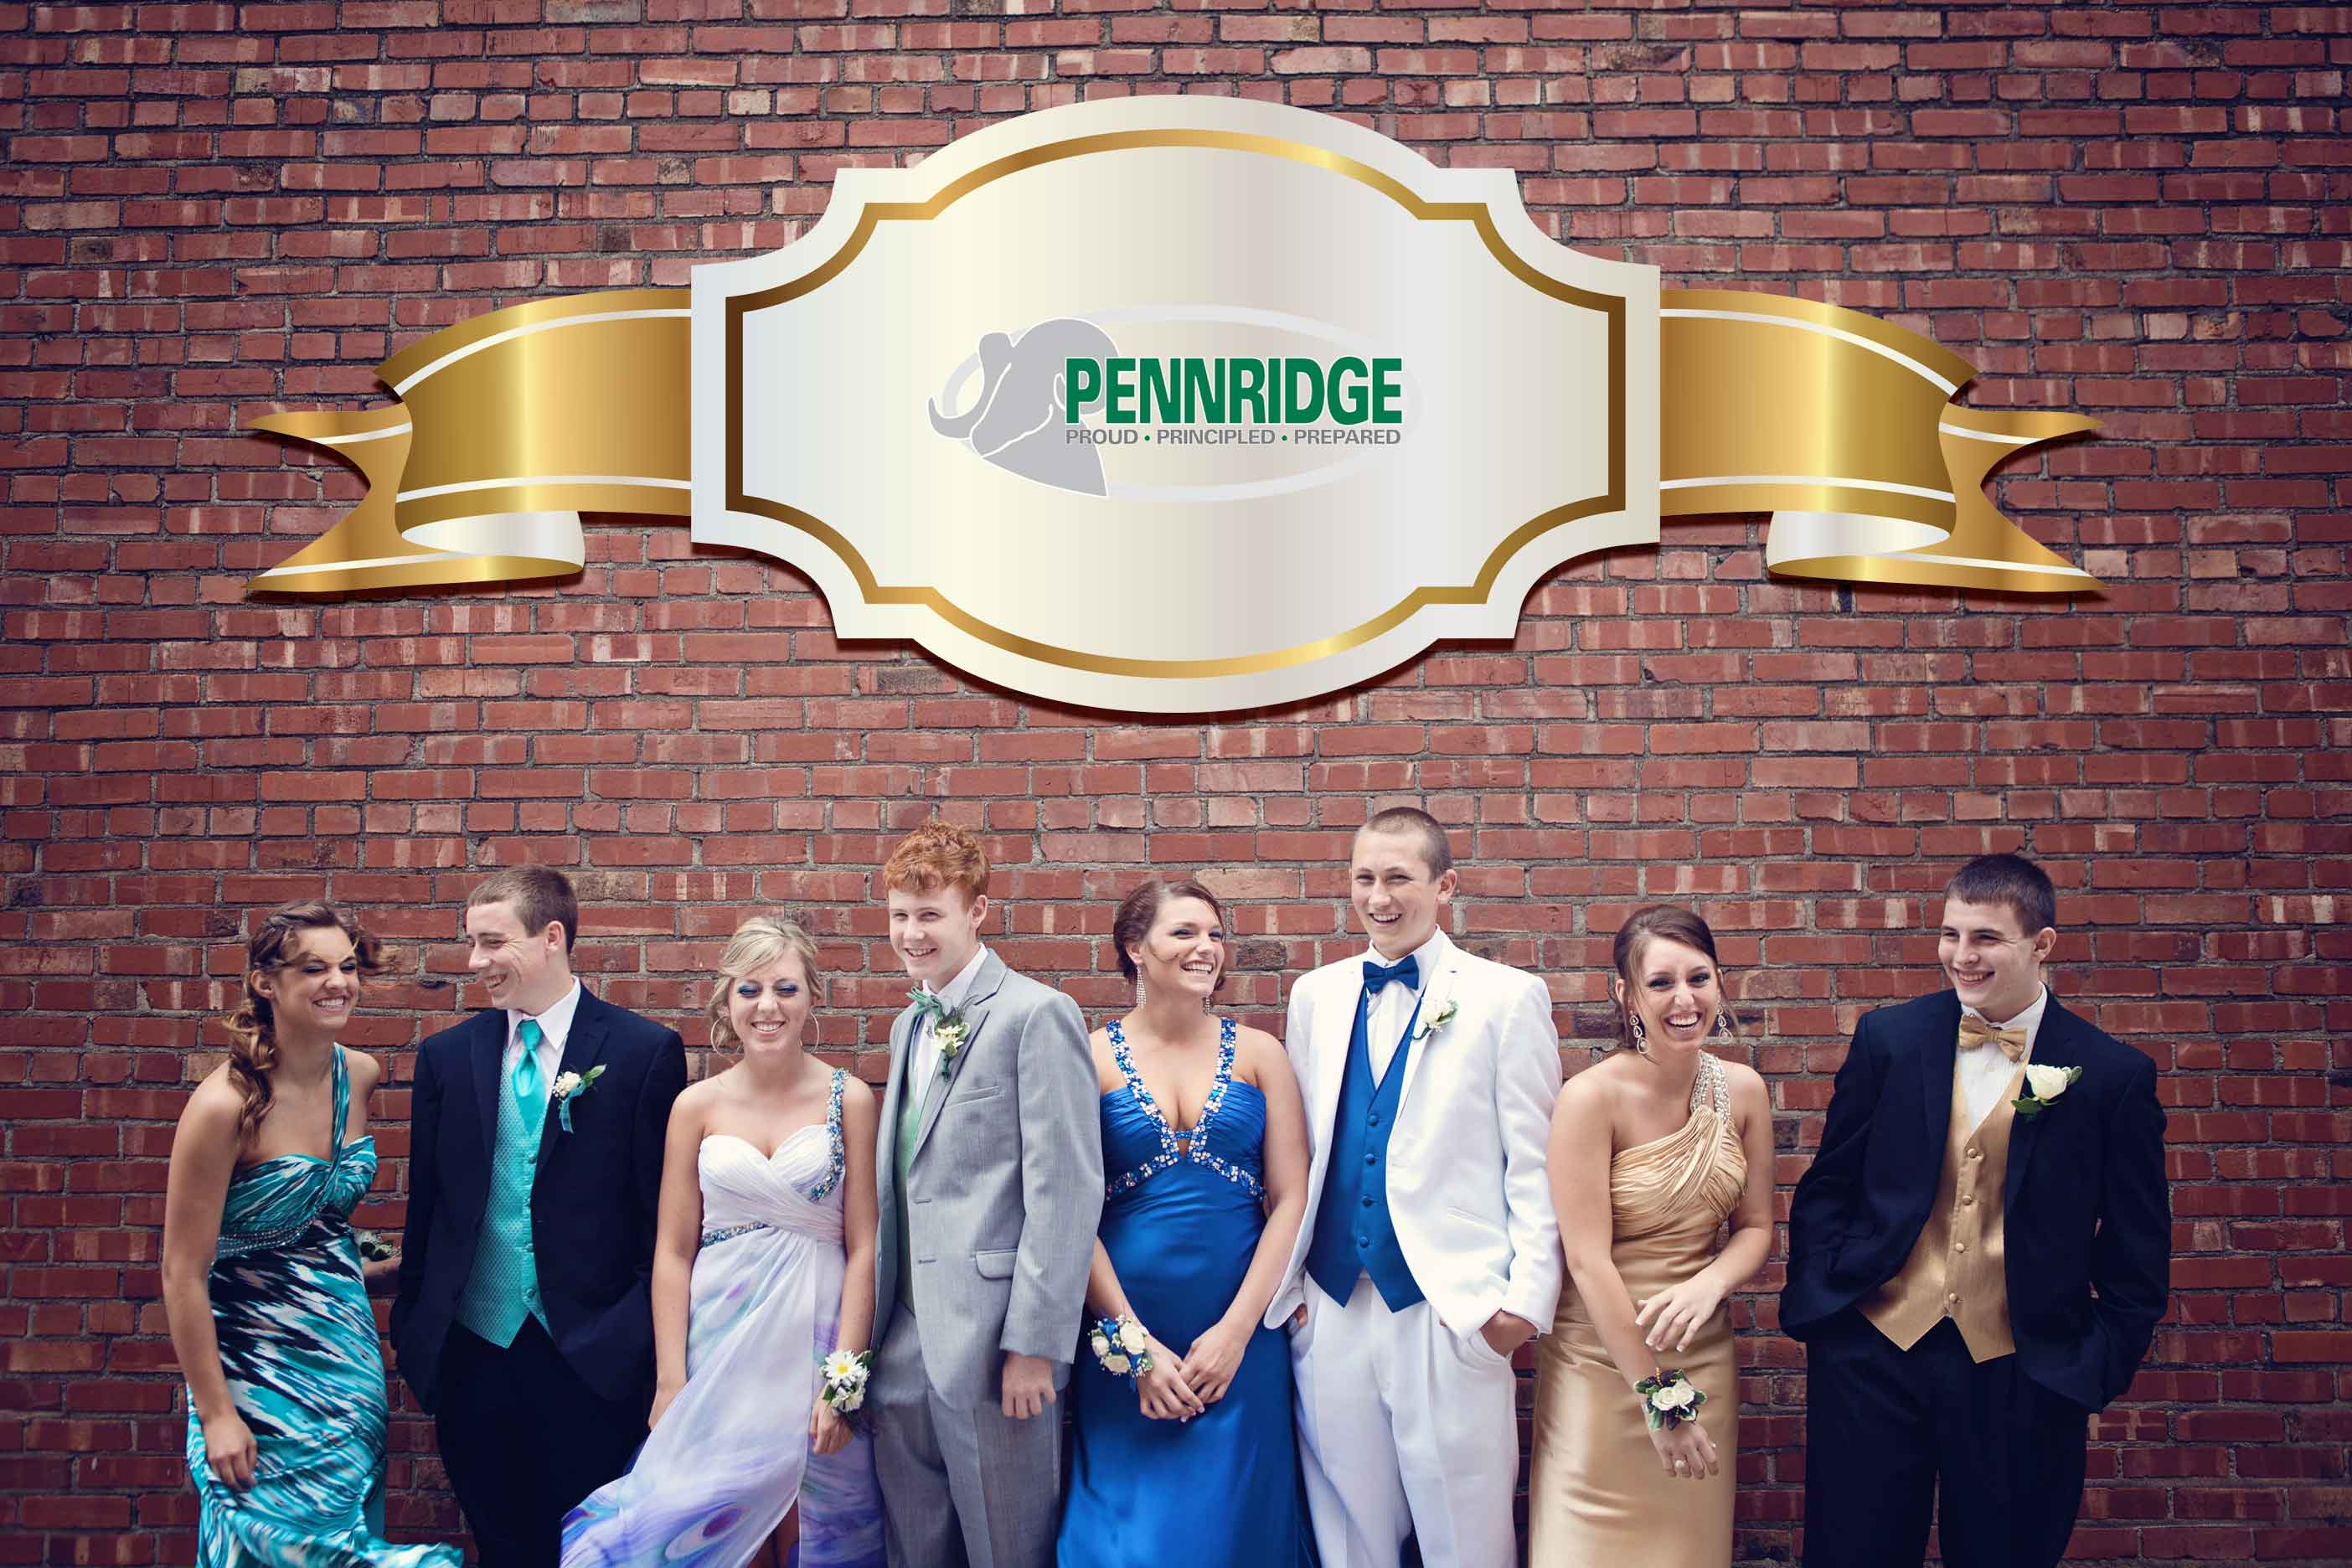 pennridge high school prom